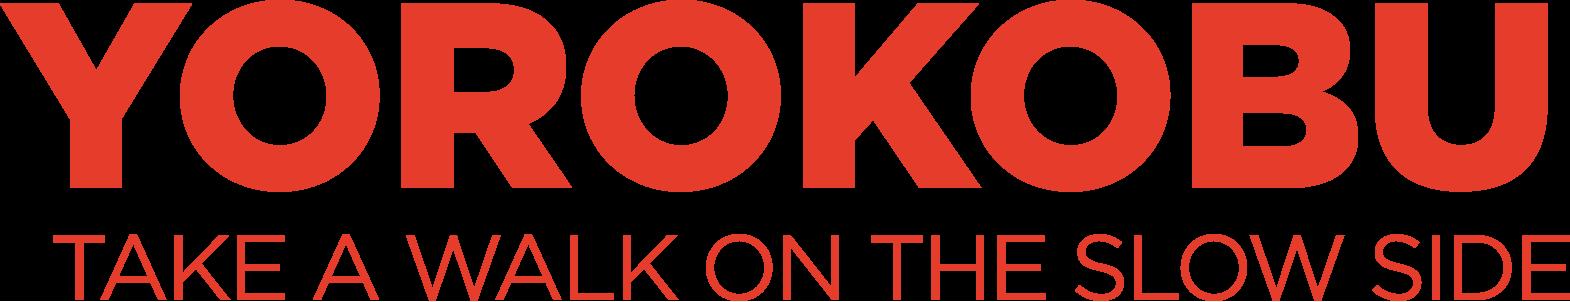 yorokobu.png